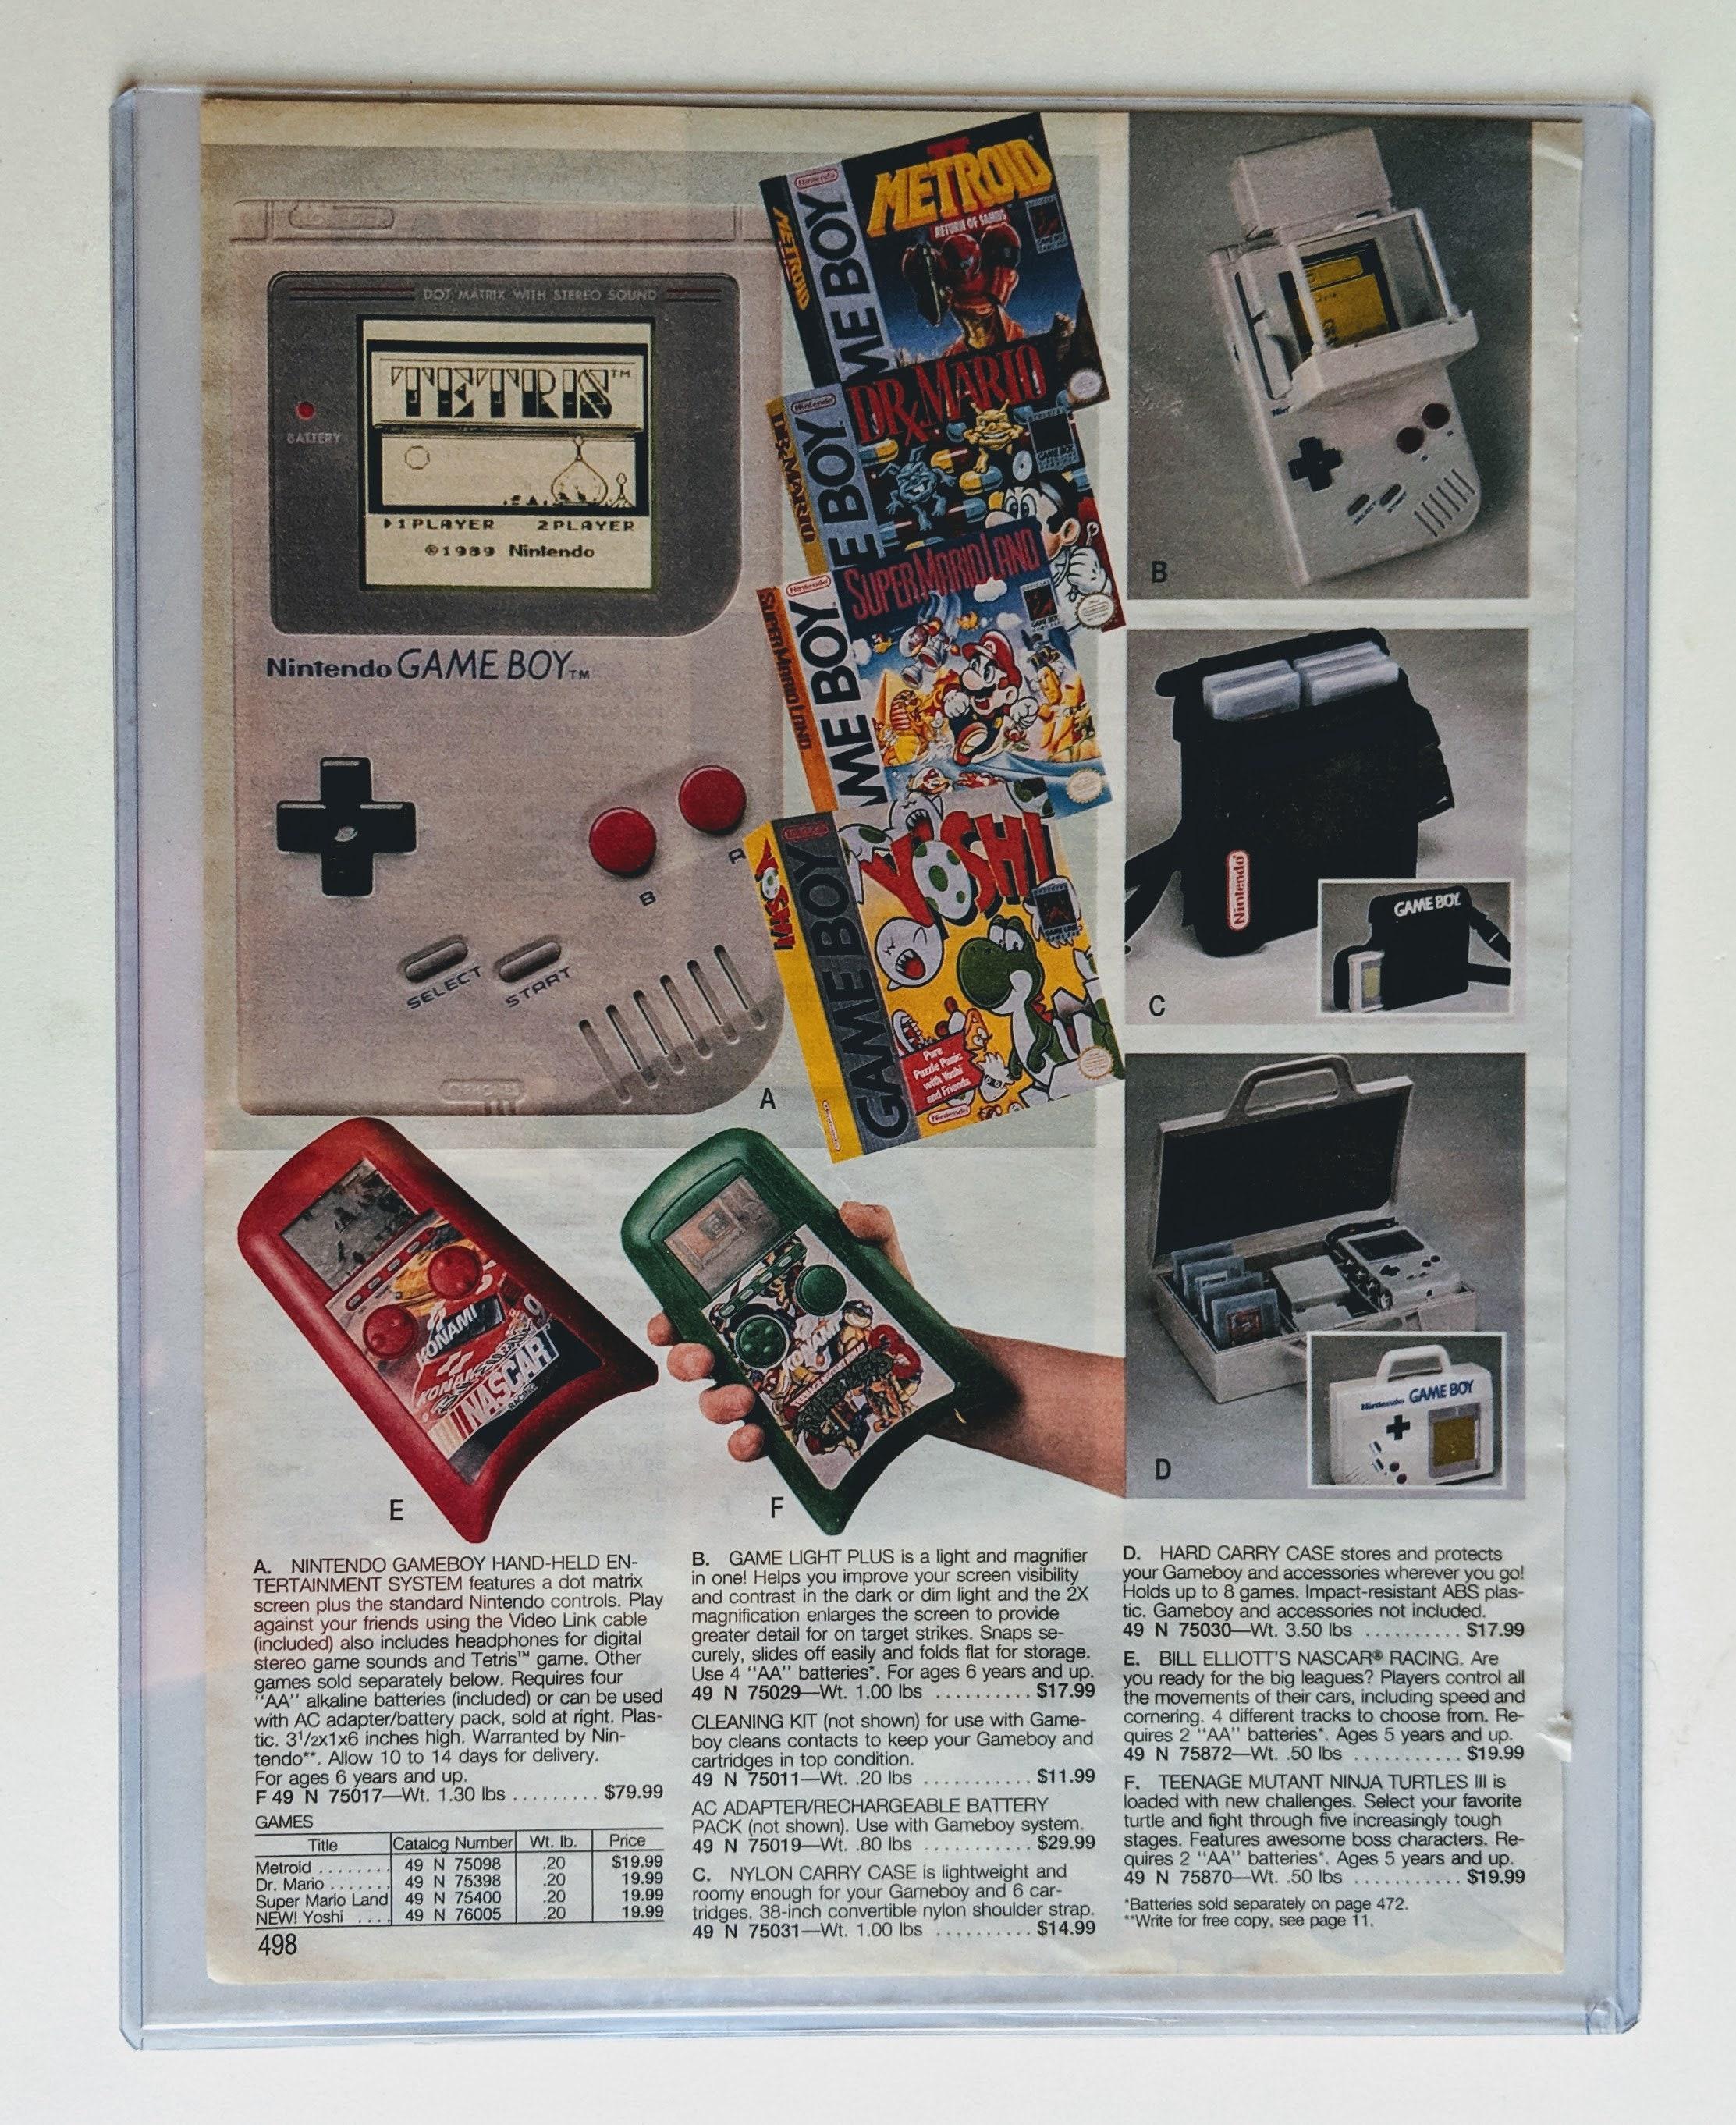 Original 90s Retro Sears Wish Book Ad Vintage Game Room Mancave Wall Decor